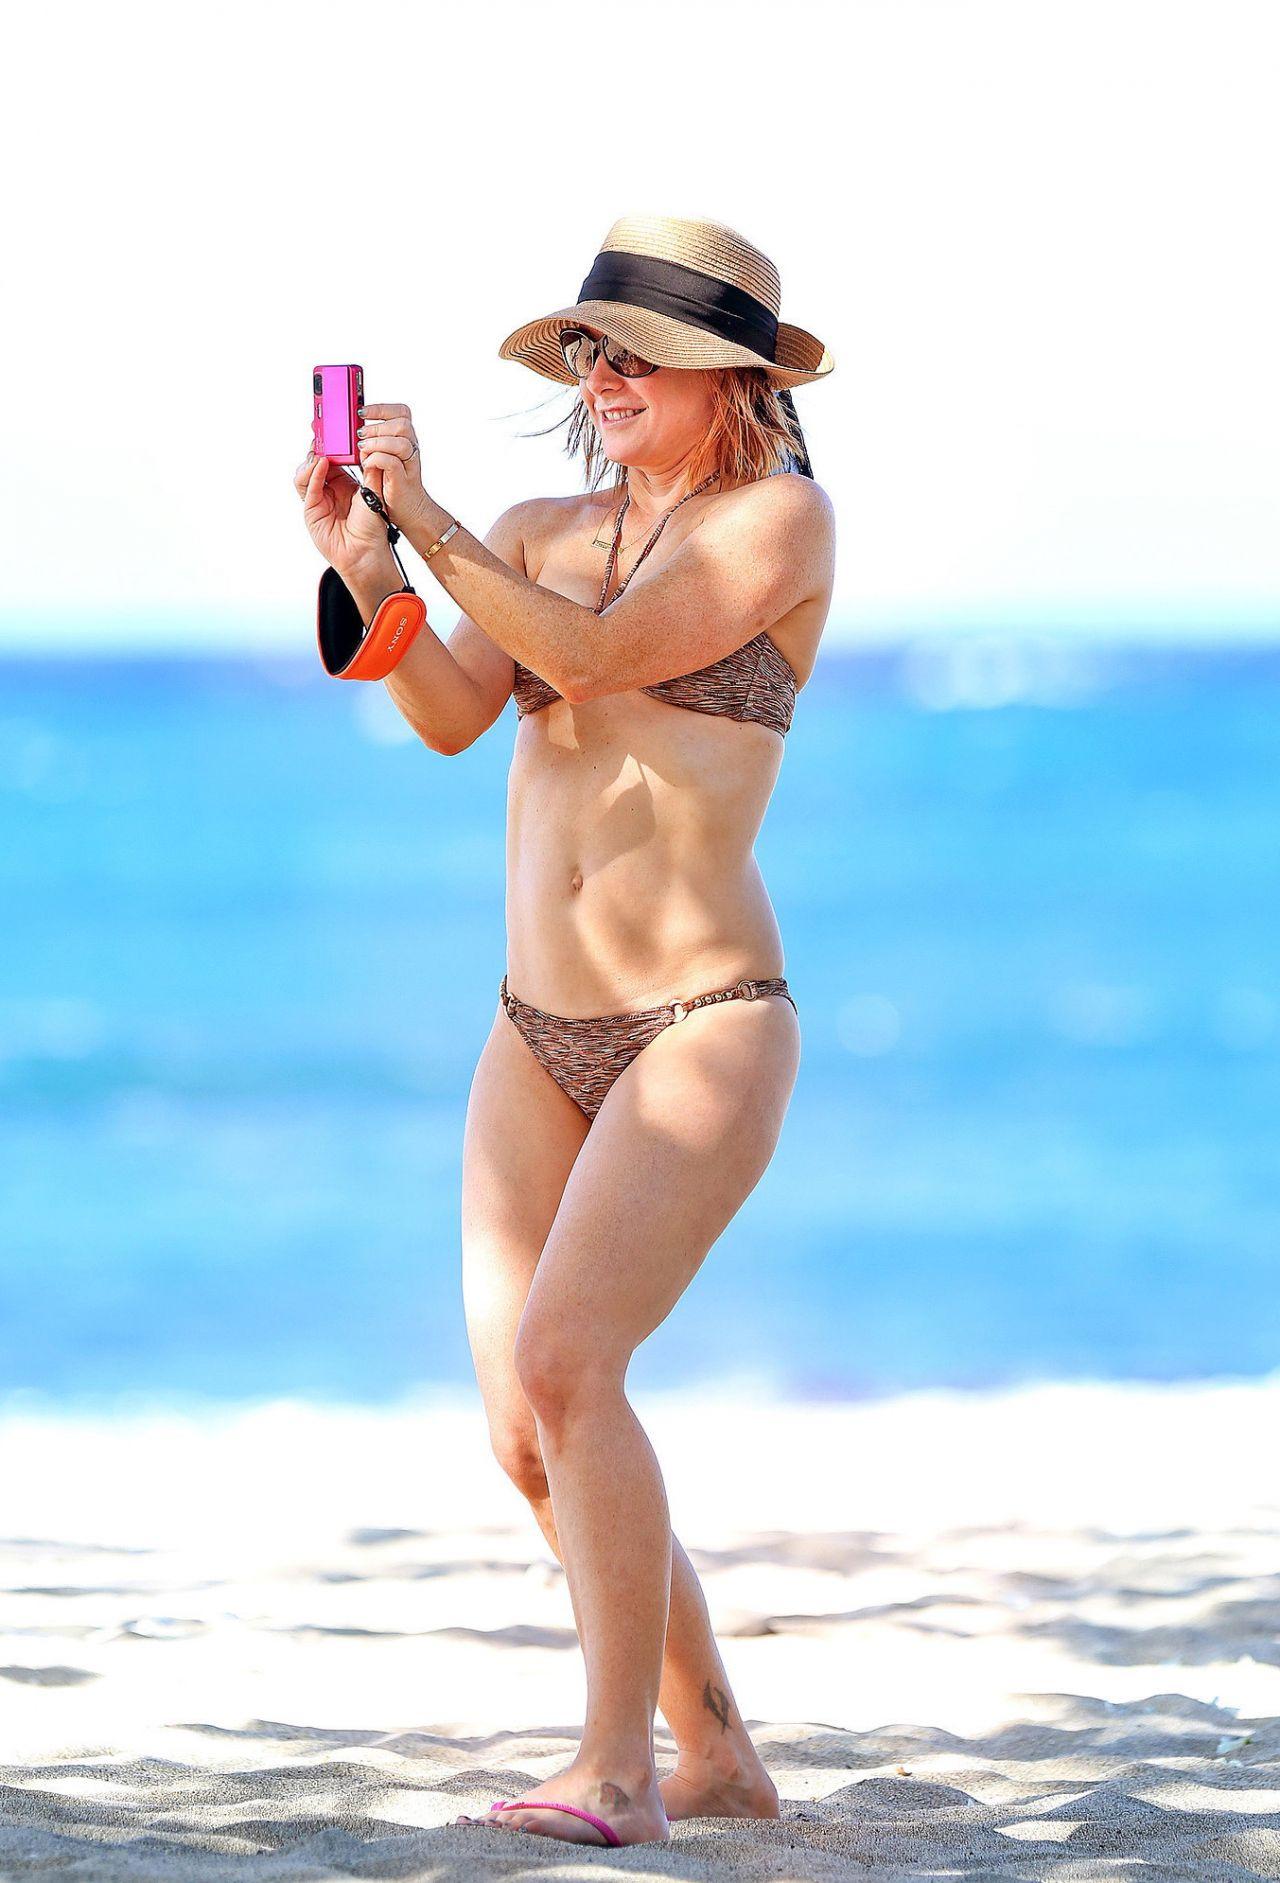 Bikini Alyson Hannigan nudes (64 foto and video), Ass, Bikini, Instagram, lingerie 2006